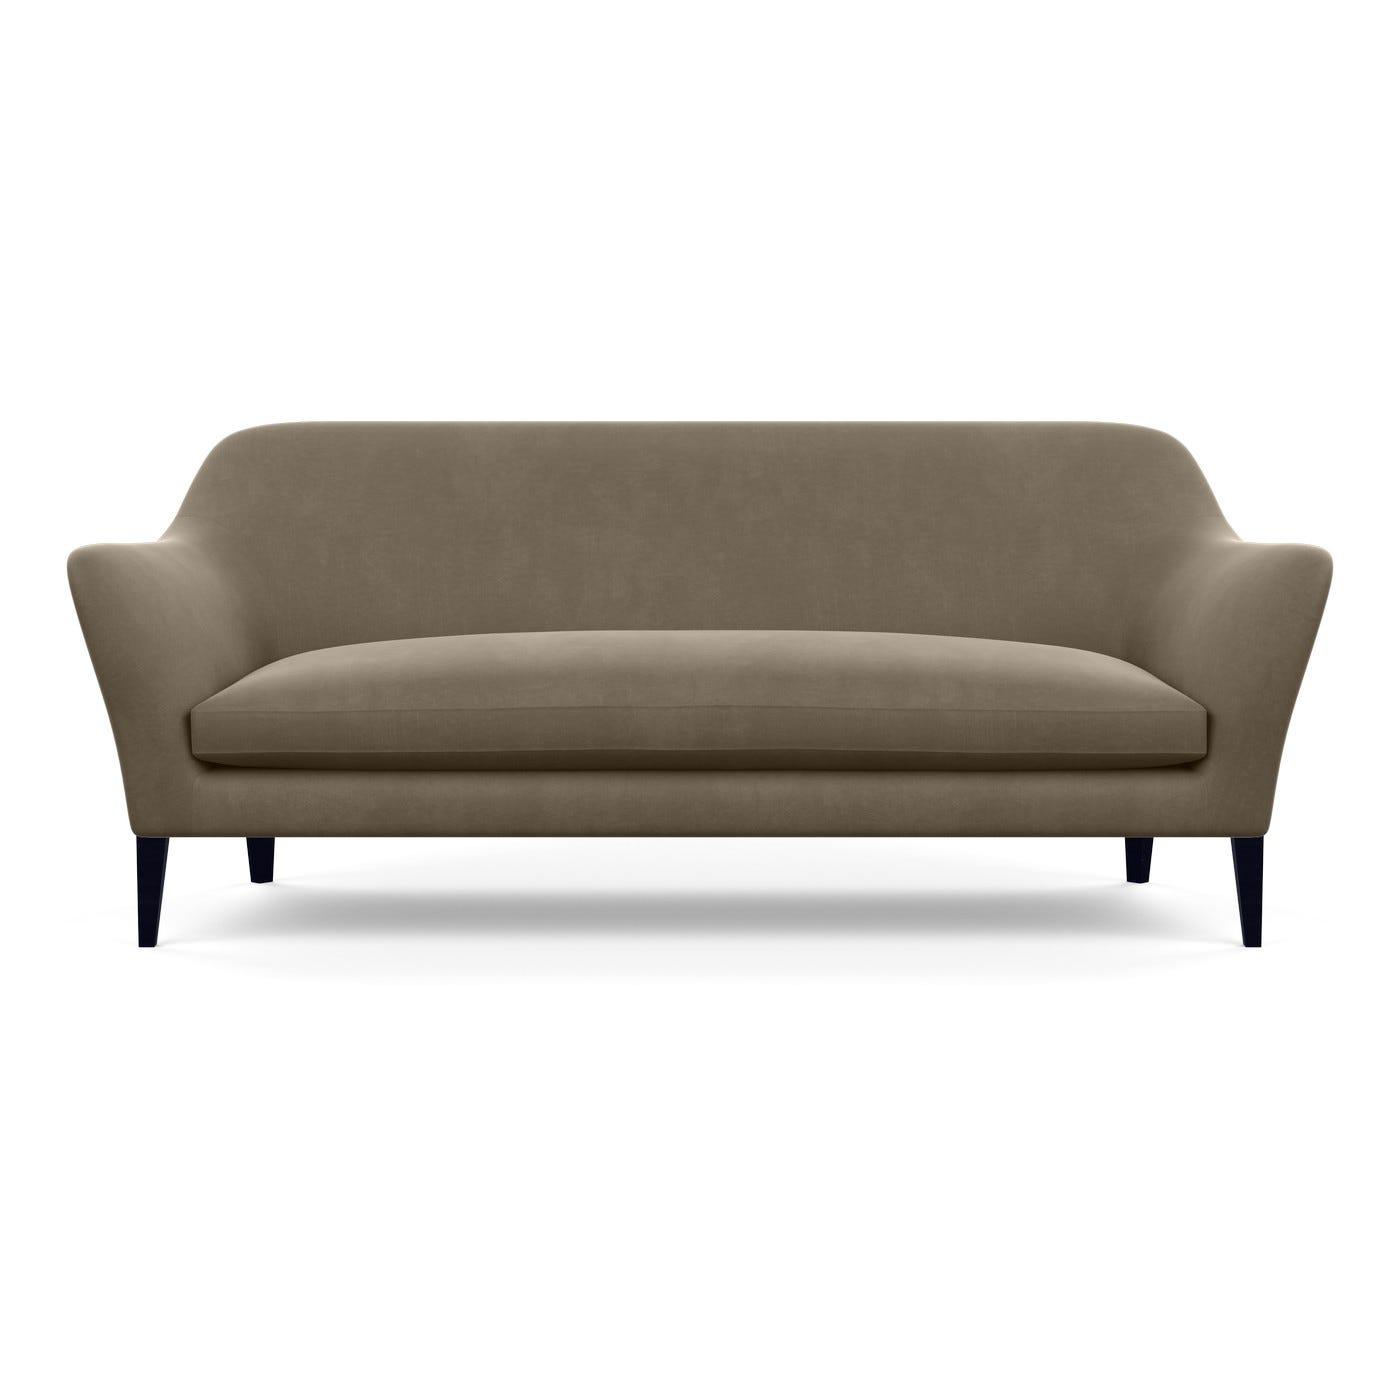 Wallis 4 Seater Sofa